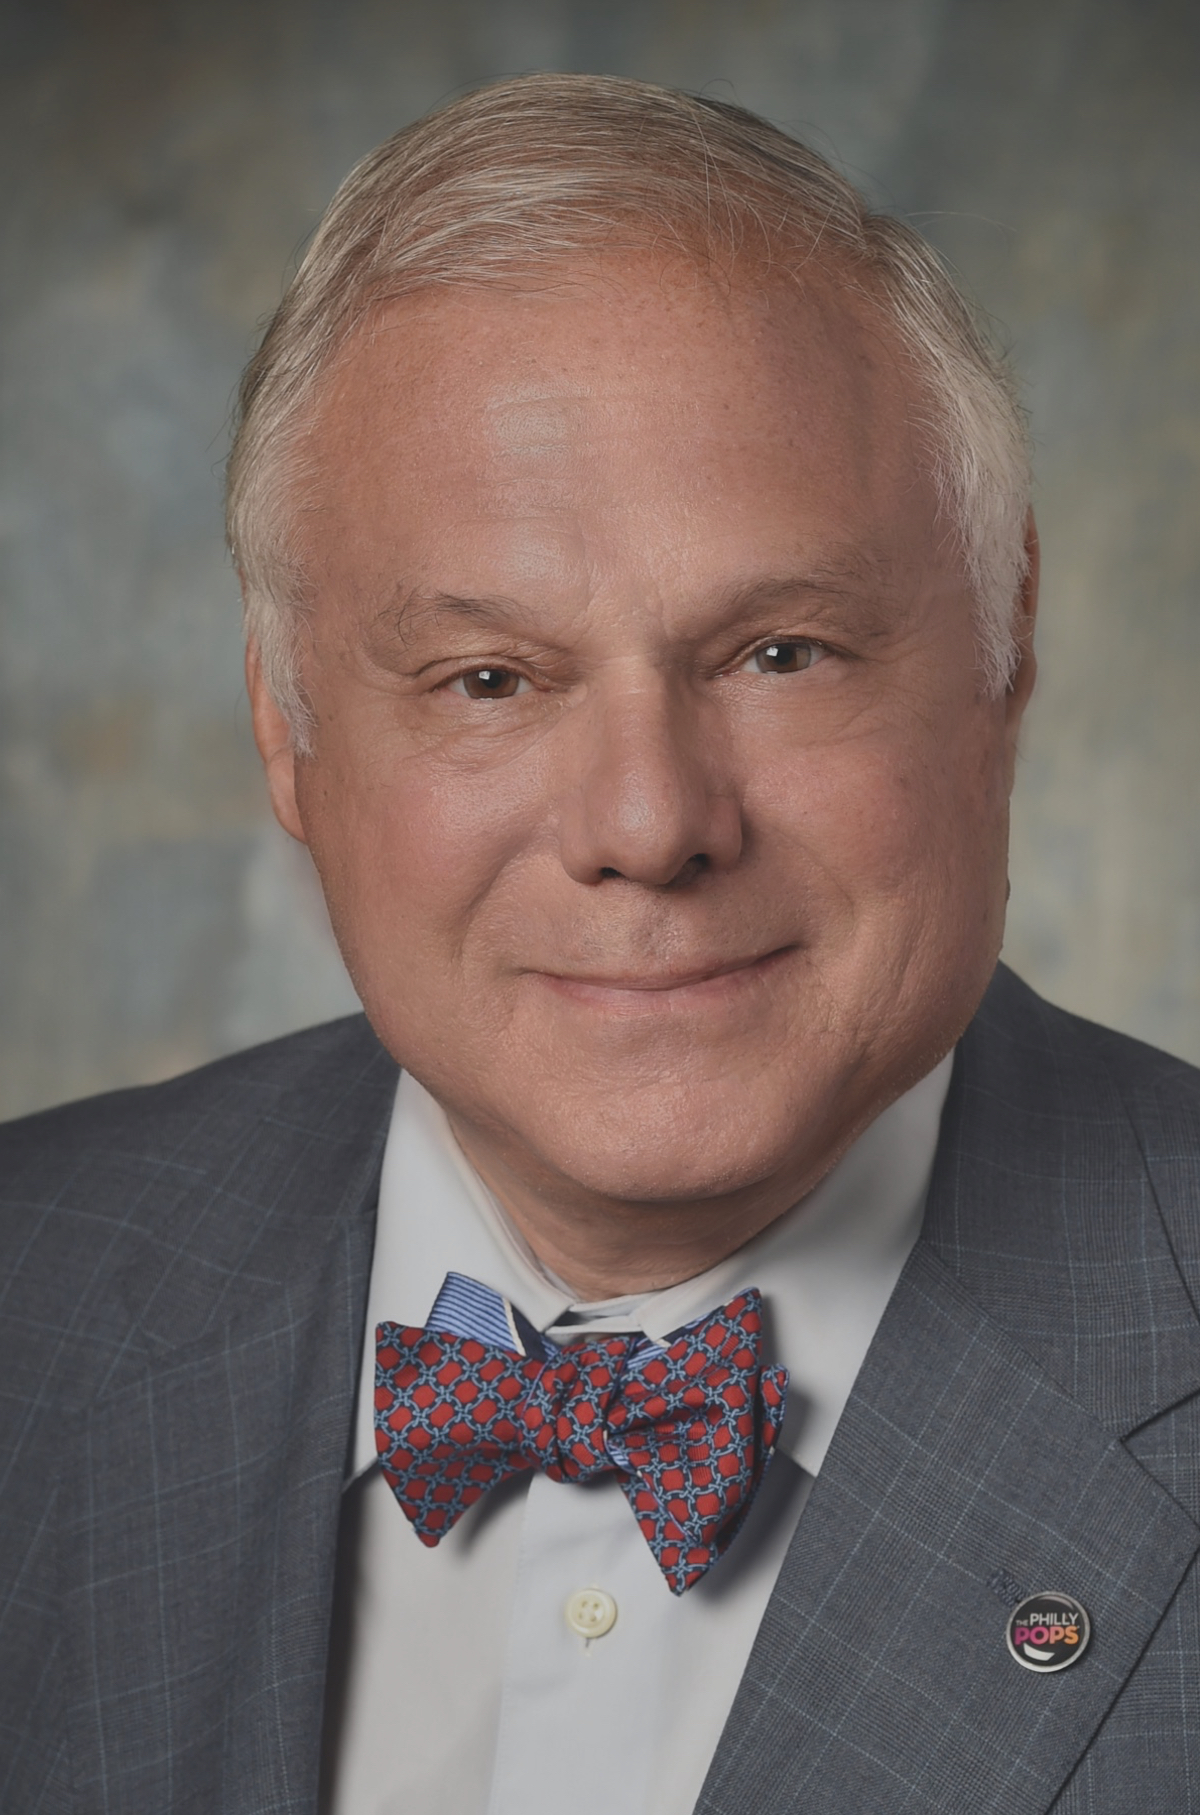 Frank Giordano